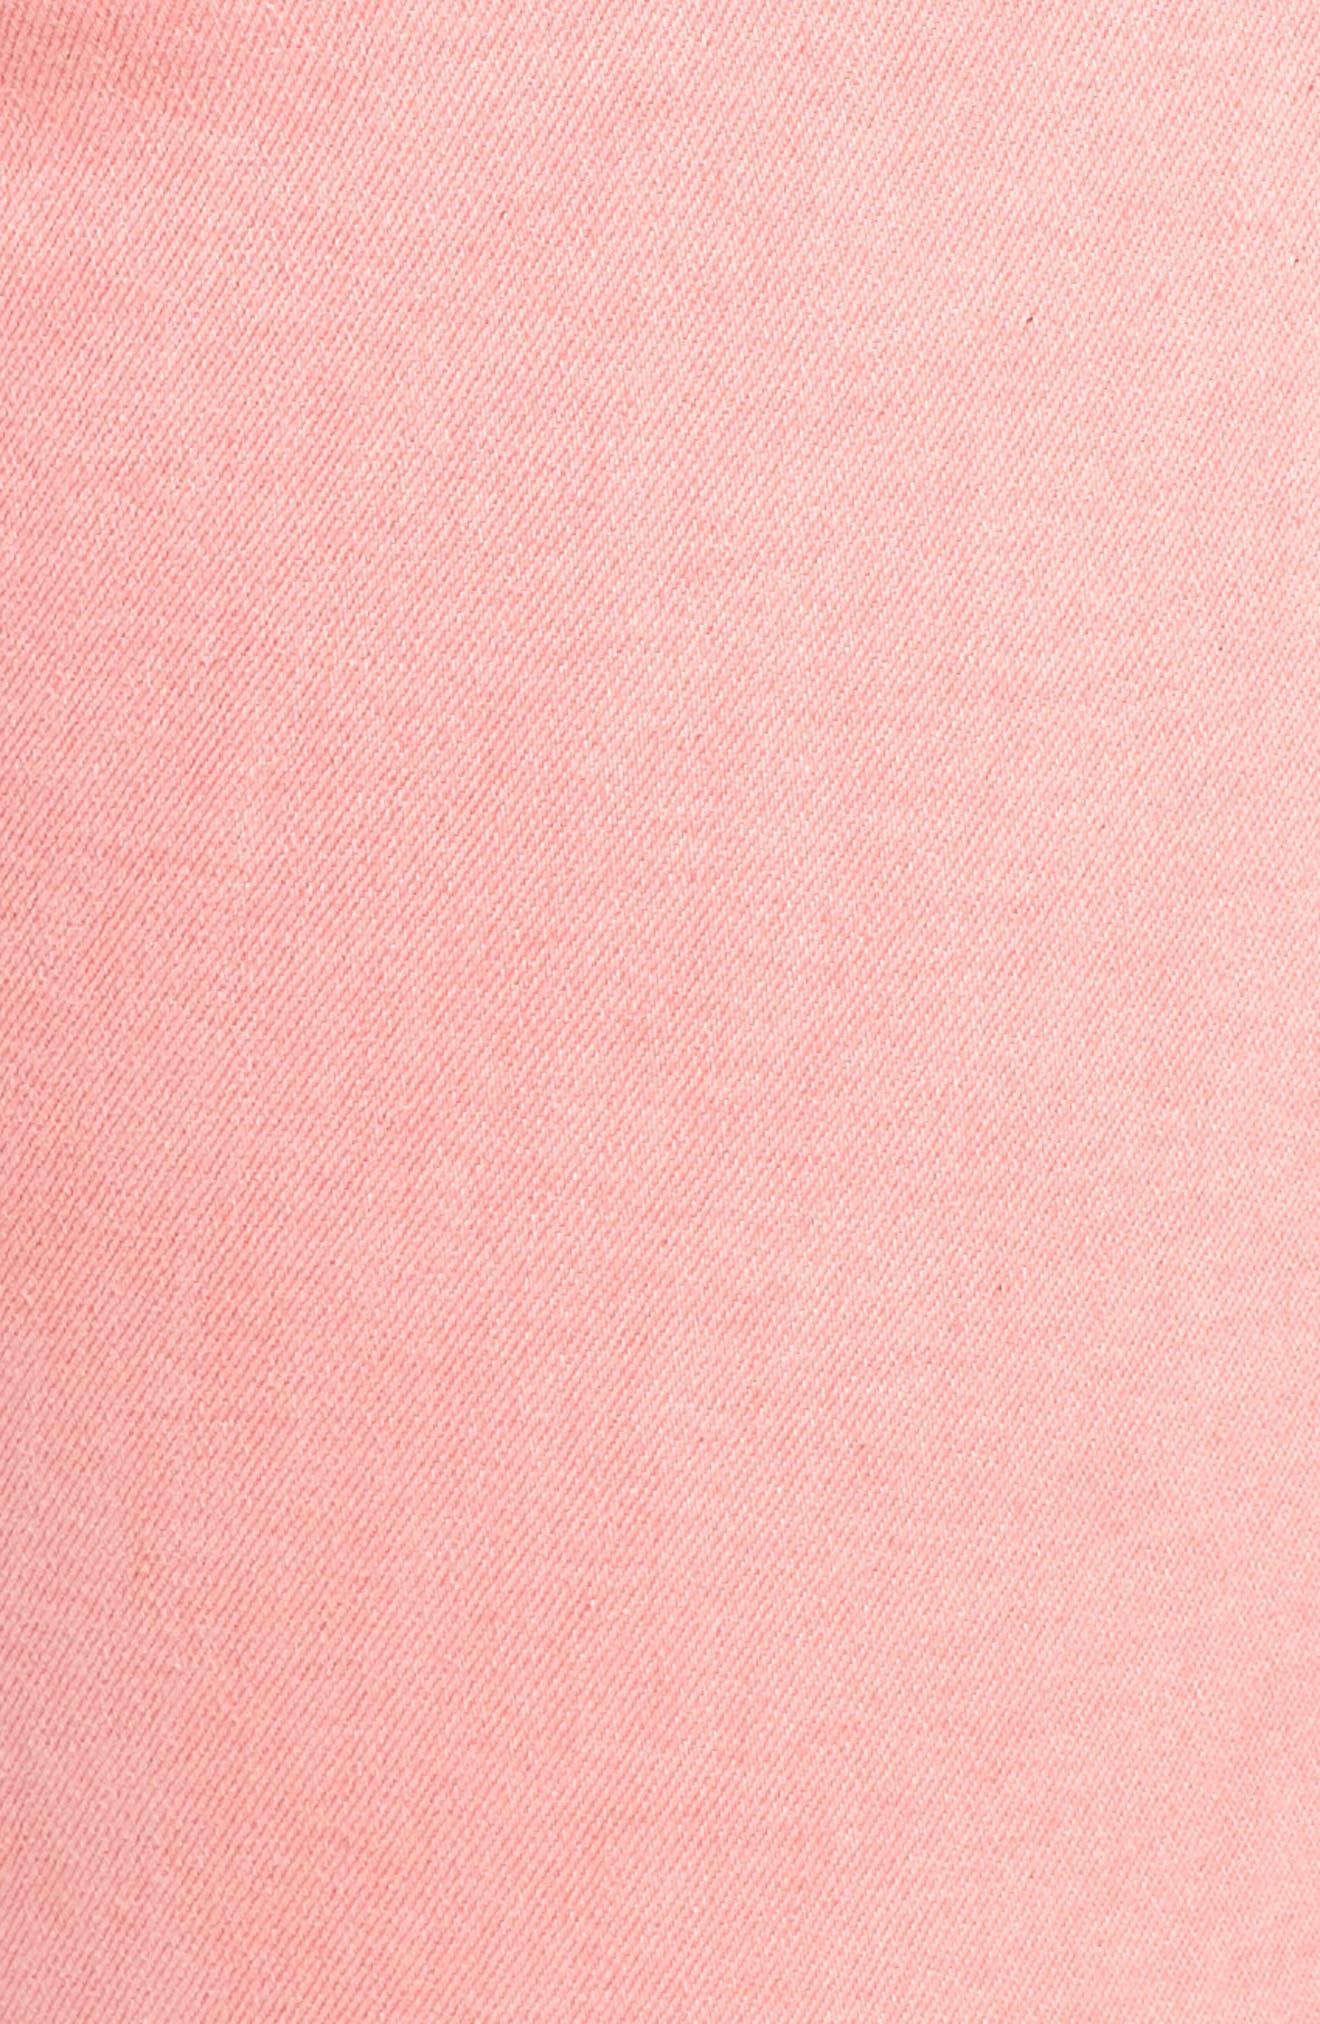 SANCTUARY,                             Social Standard Ankle Skinny Jeans,                             Alternate thumbnail 6, color,                             DK PNK FIZ